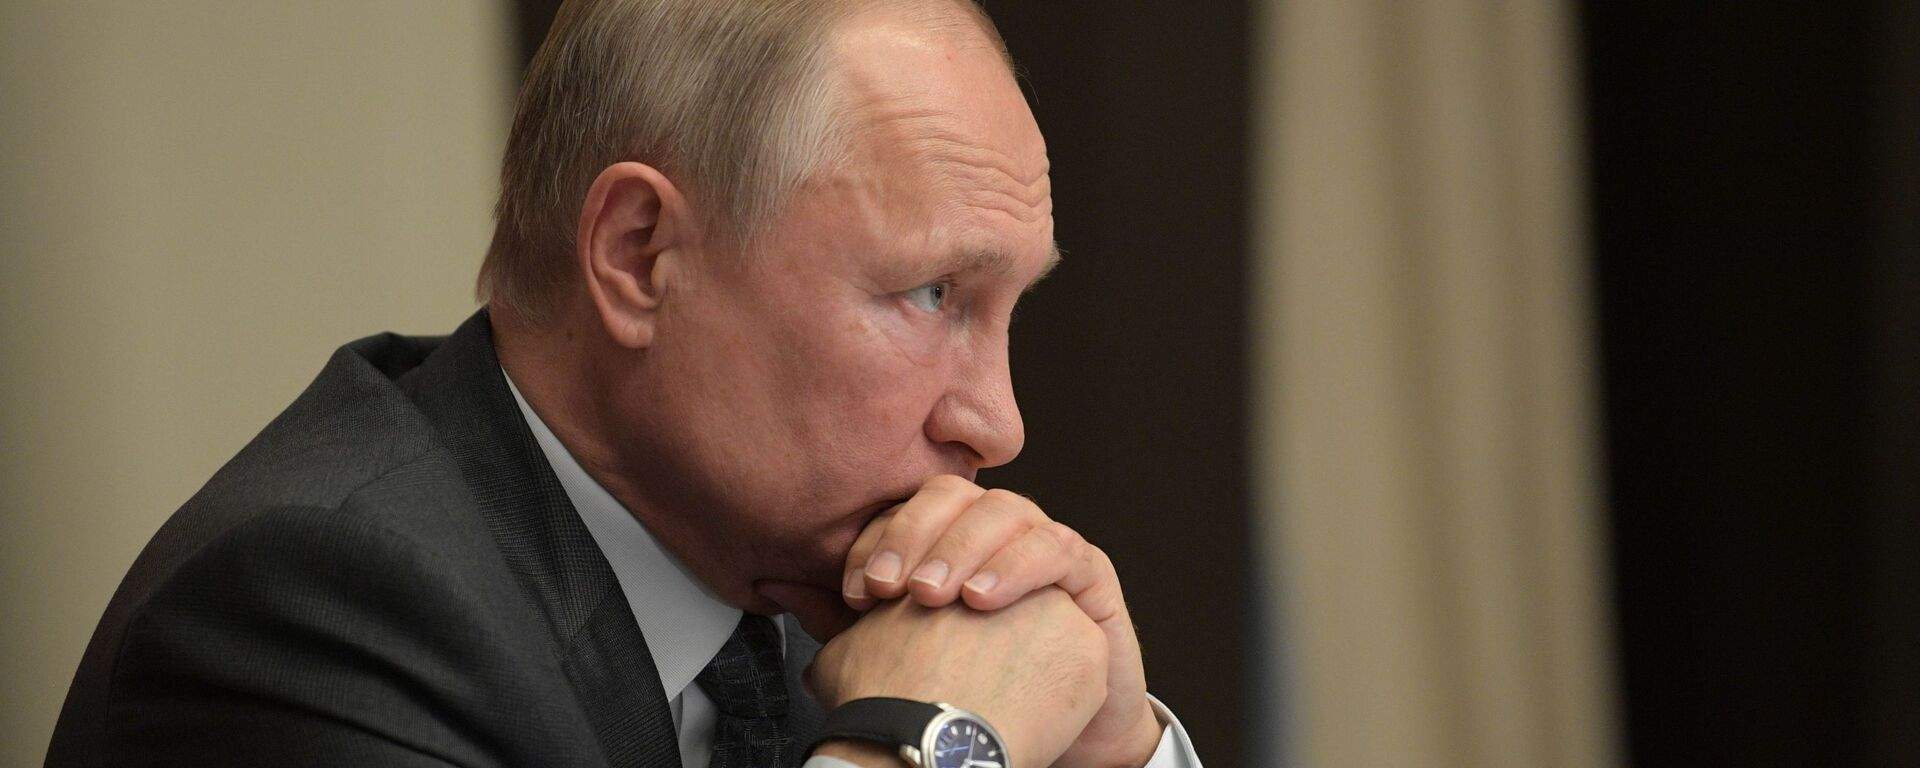 Президент РФ Владимир Путин  - Sputnik Армения, 1920, 13.10.2021